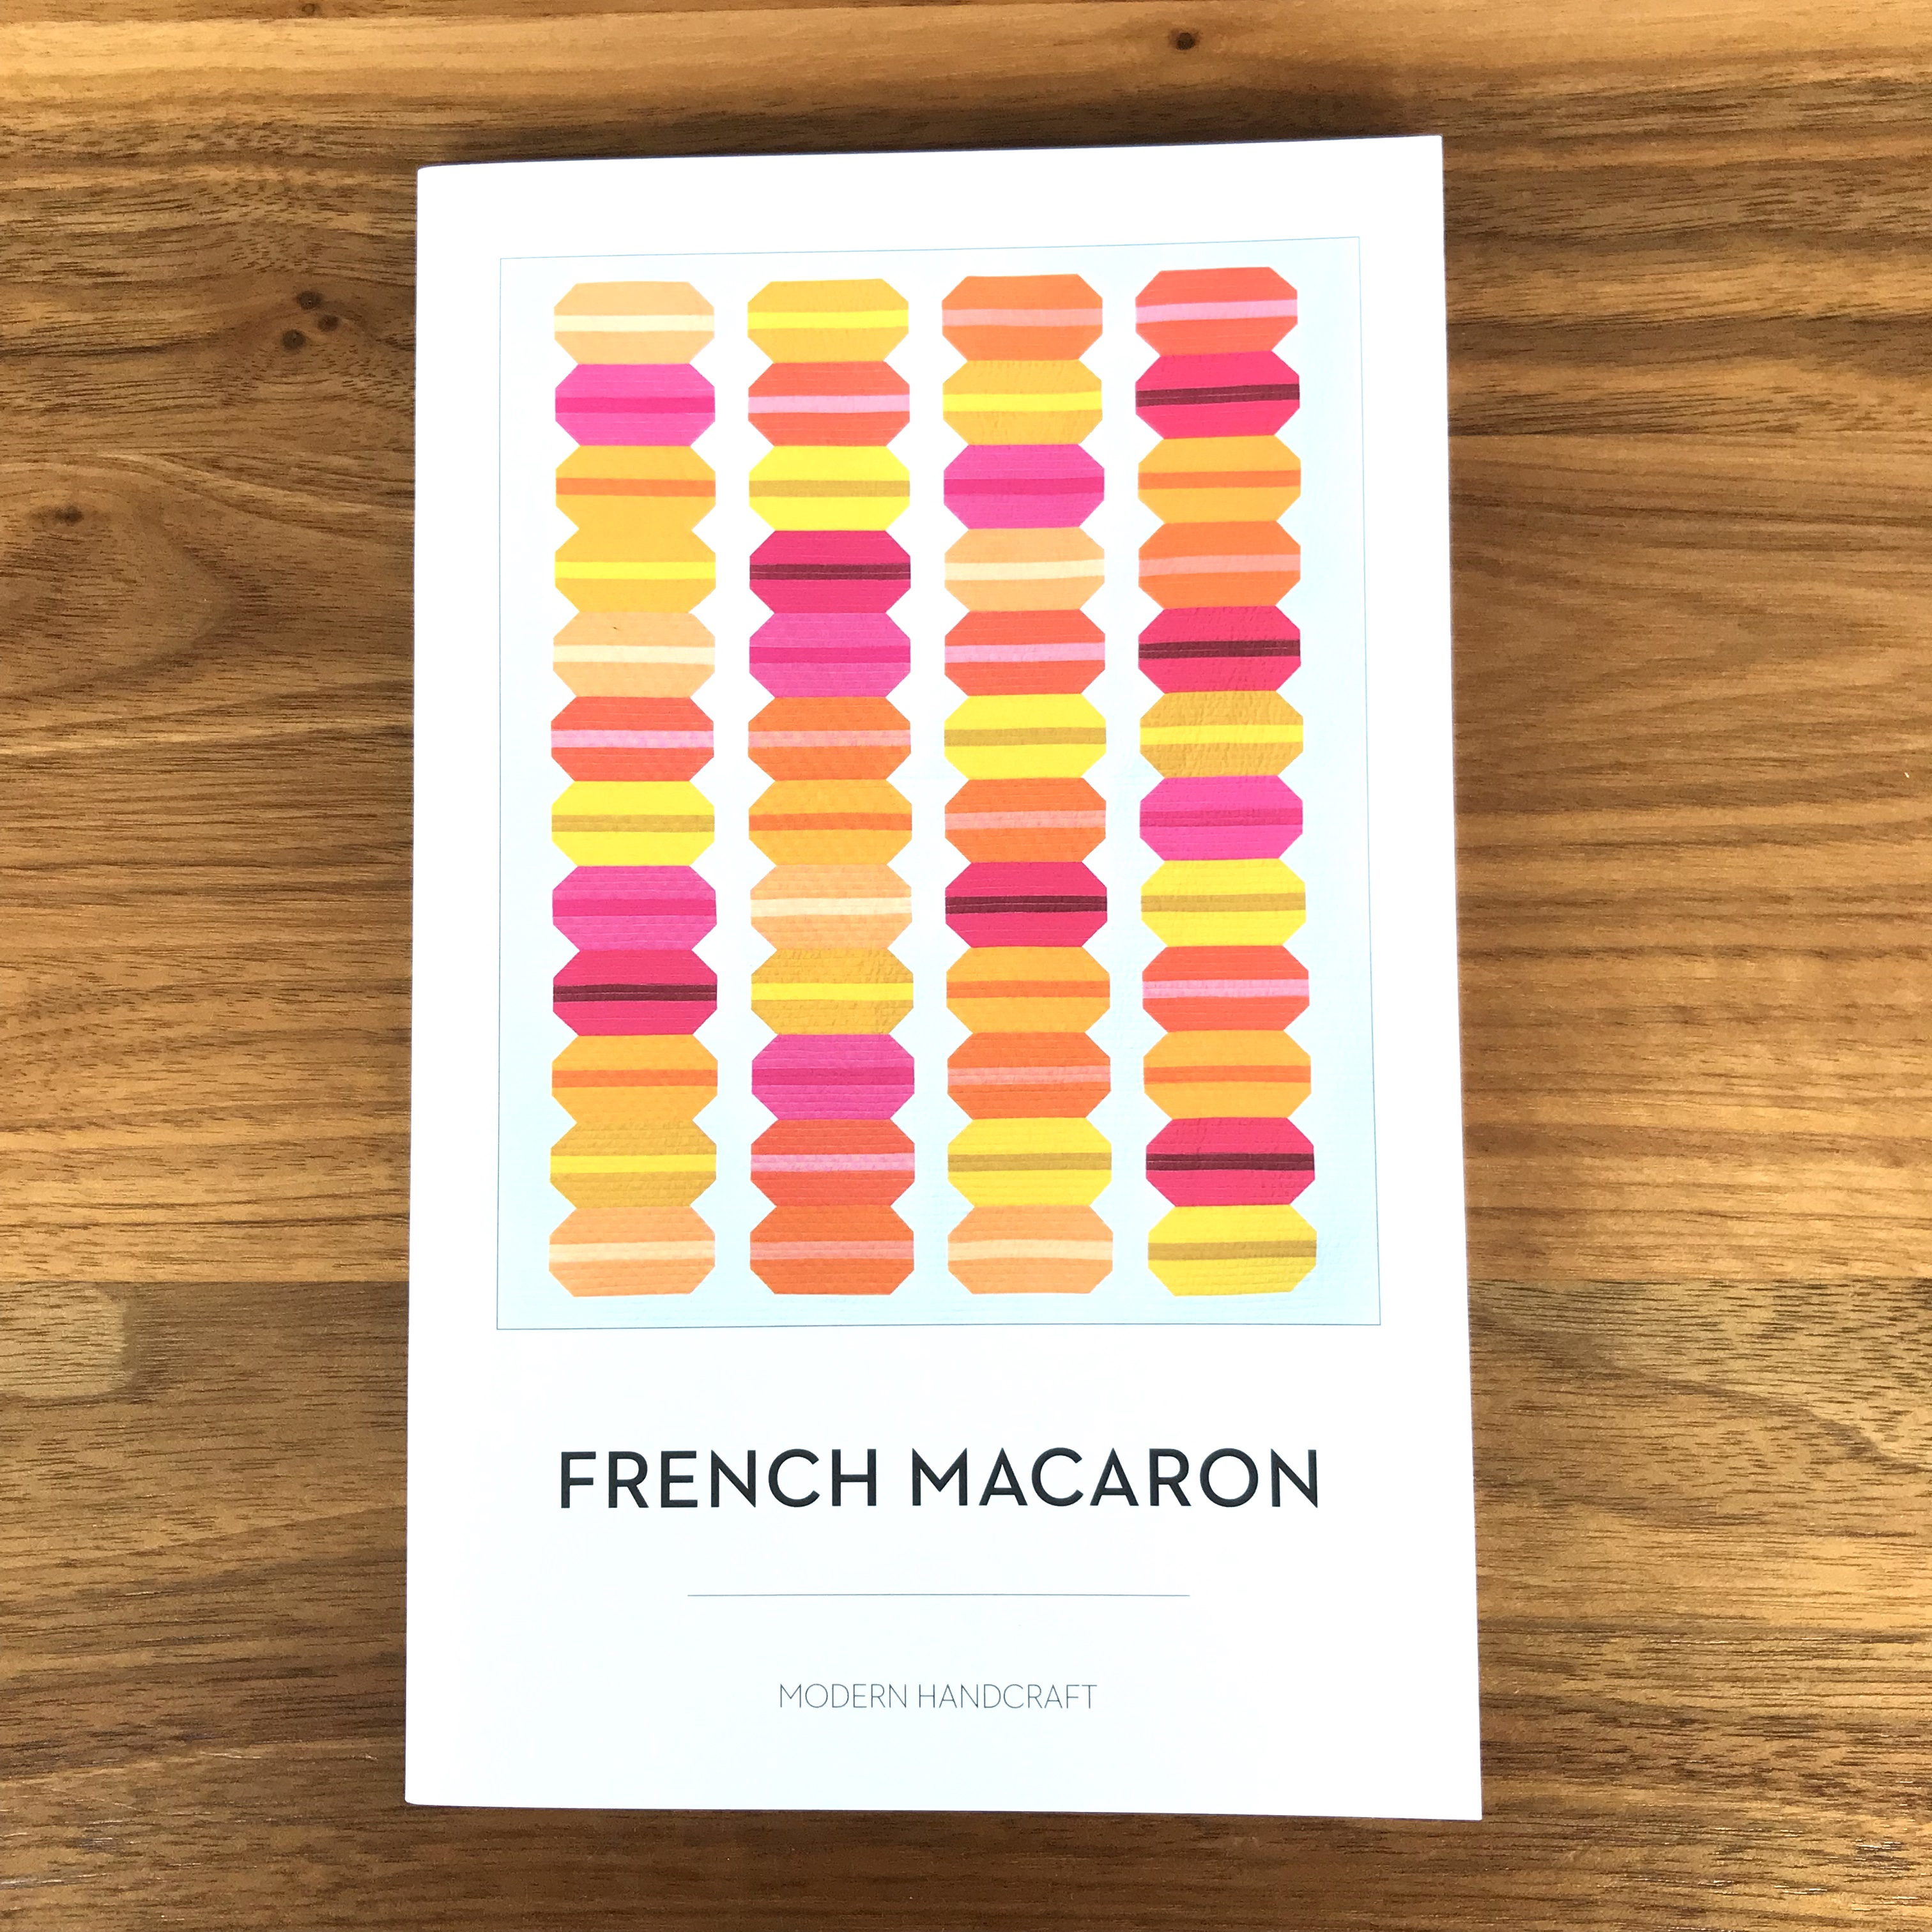 French Macaron (Modern Handcraft)